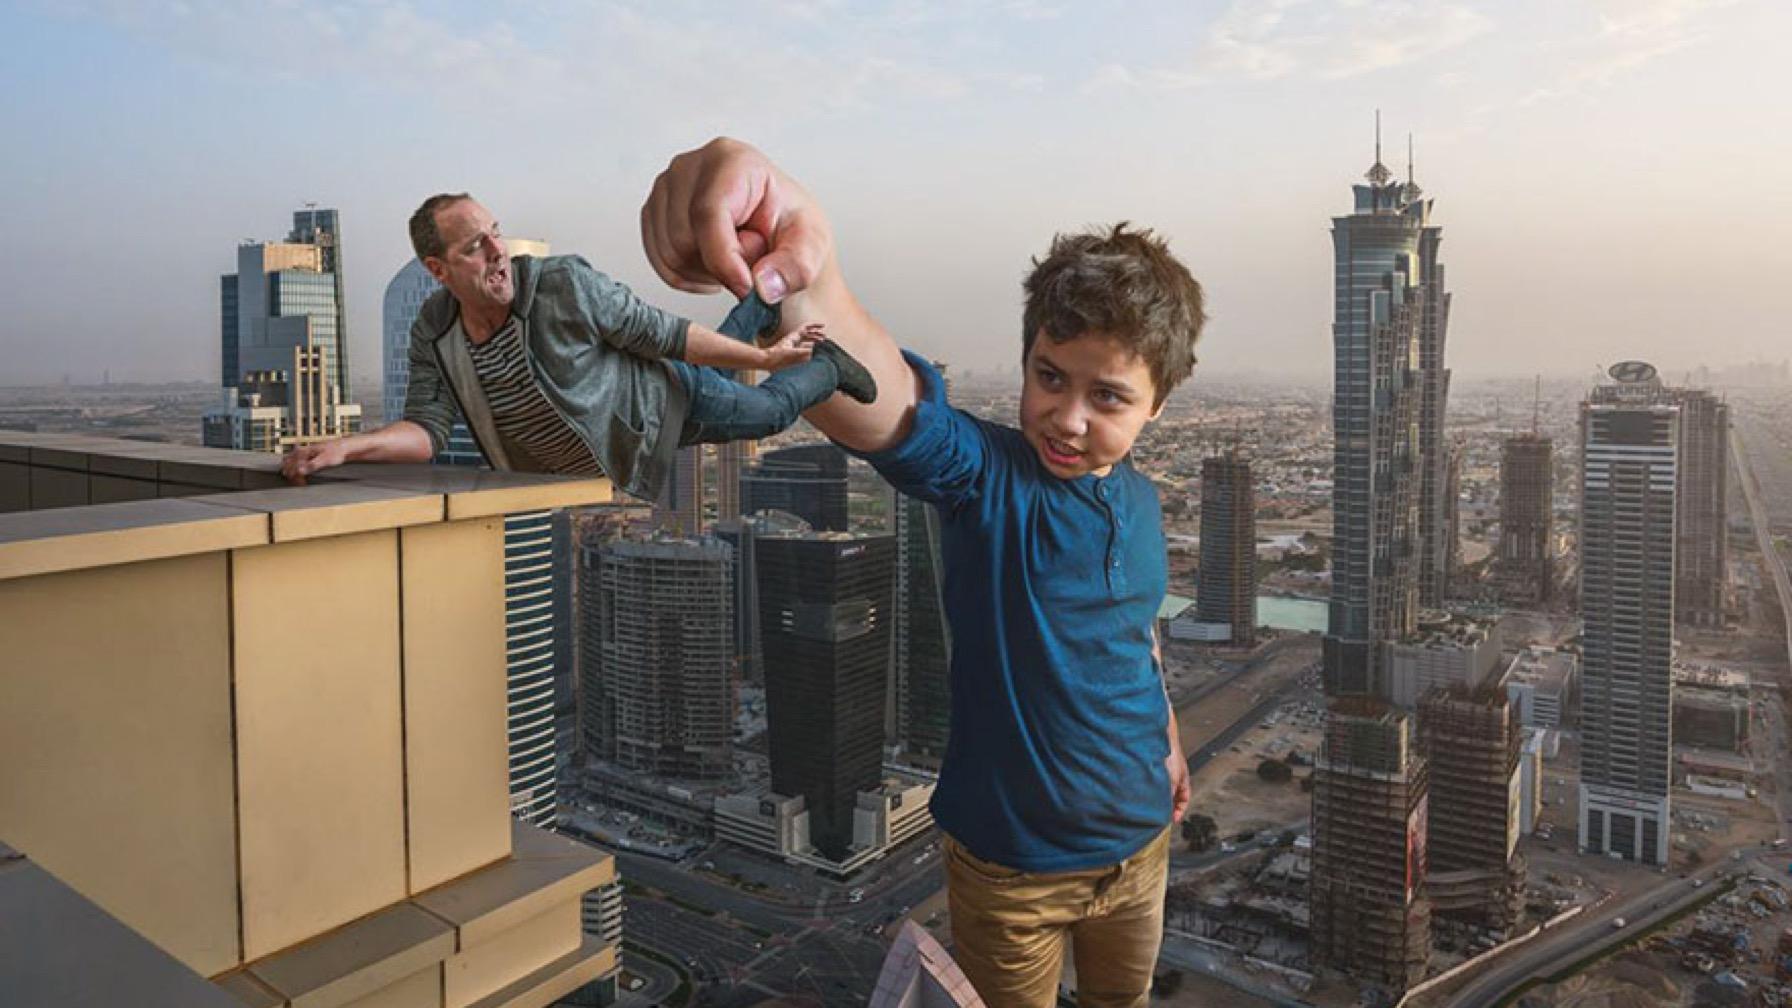 Pro Photographer Dad Photoshops Son Into Epic Scenes